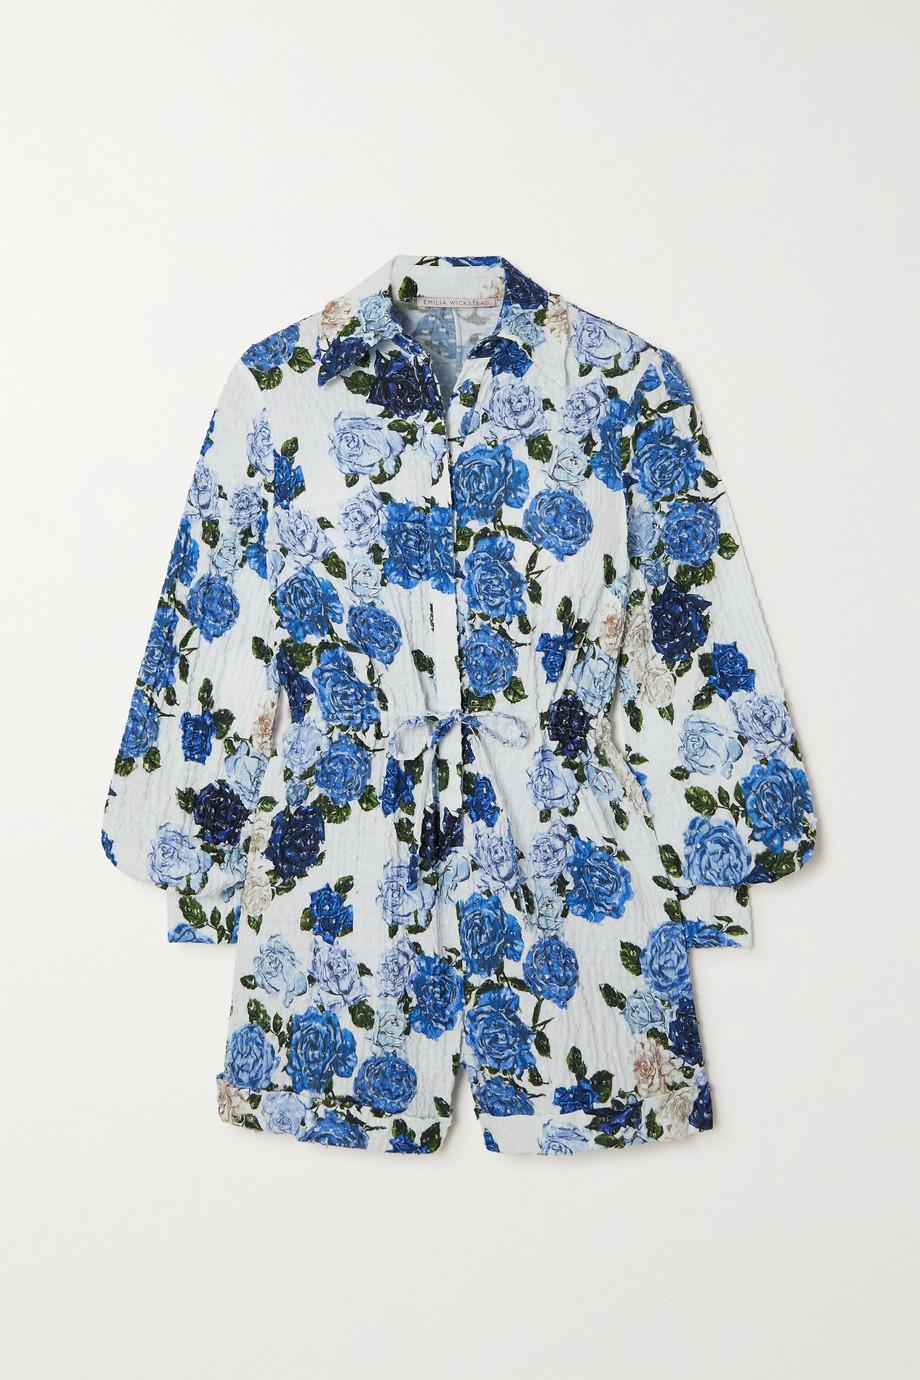 Emilia Wickstead Blanche floral-print Swiss-dot cotton-blend seersucker playsuit